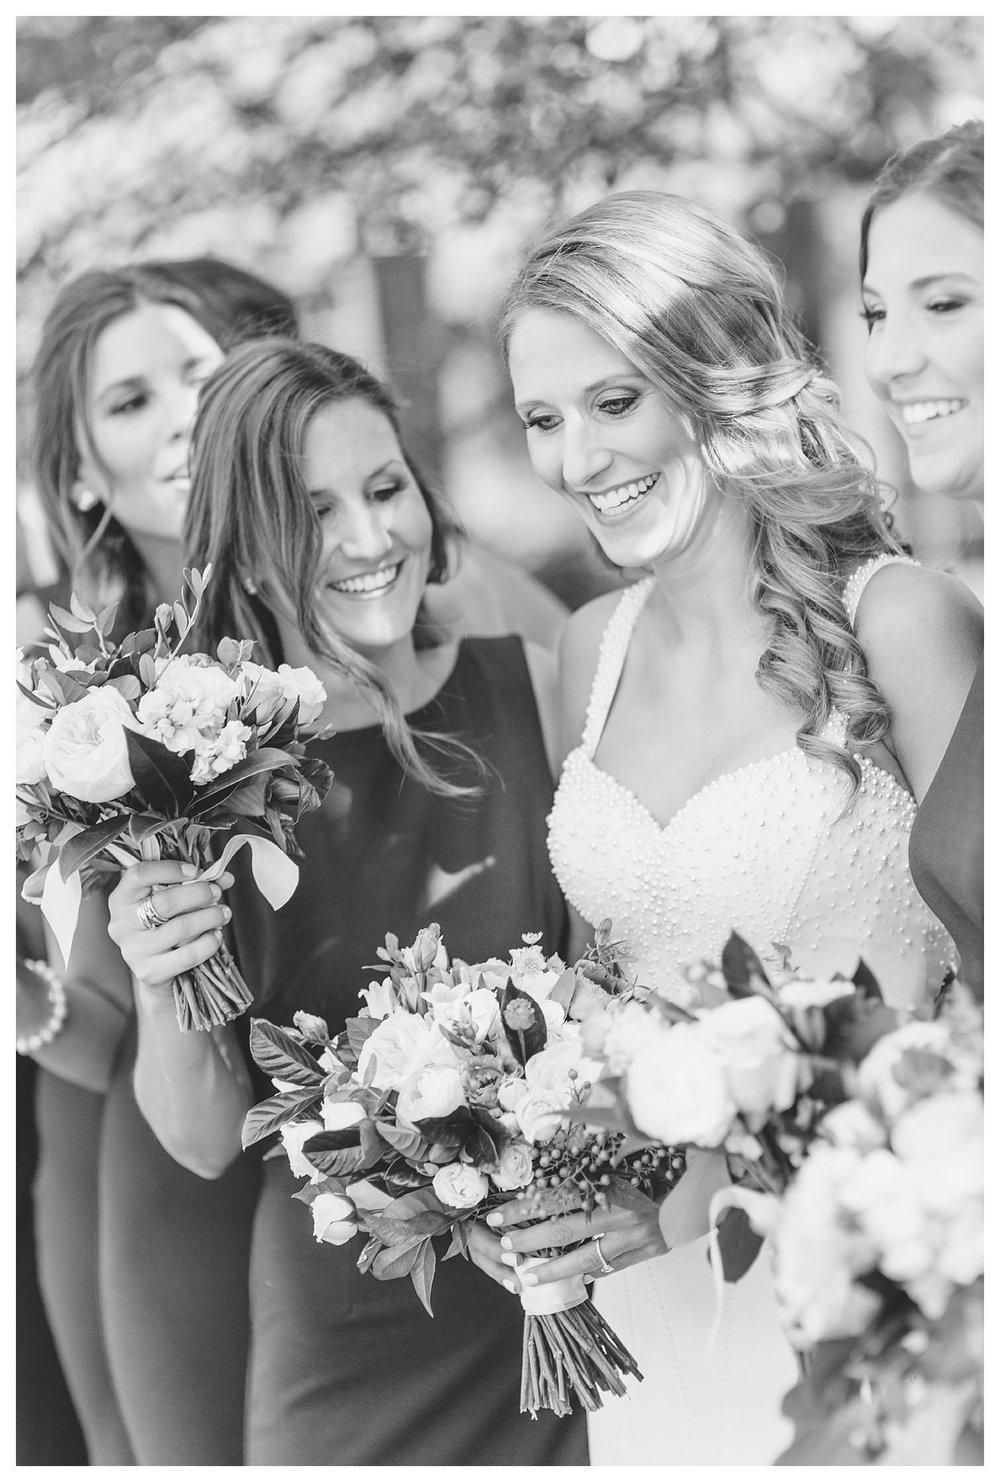 everleighphotography-cincinnati-wedding-photographer-northern-kentucky-wedding-photographer-camargo-country-club-the-karsh-wedding-20